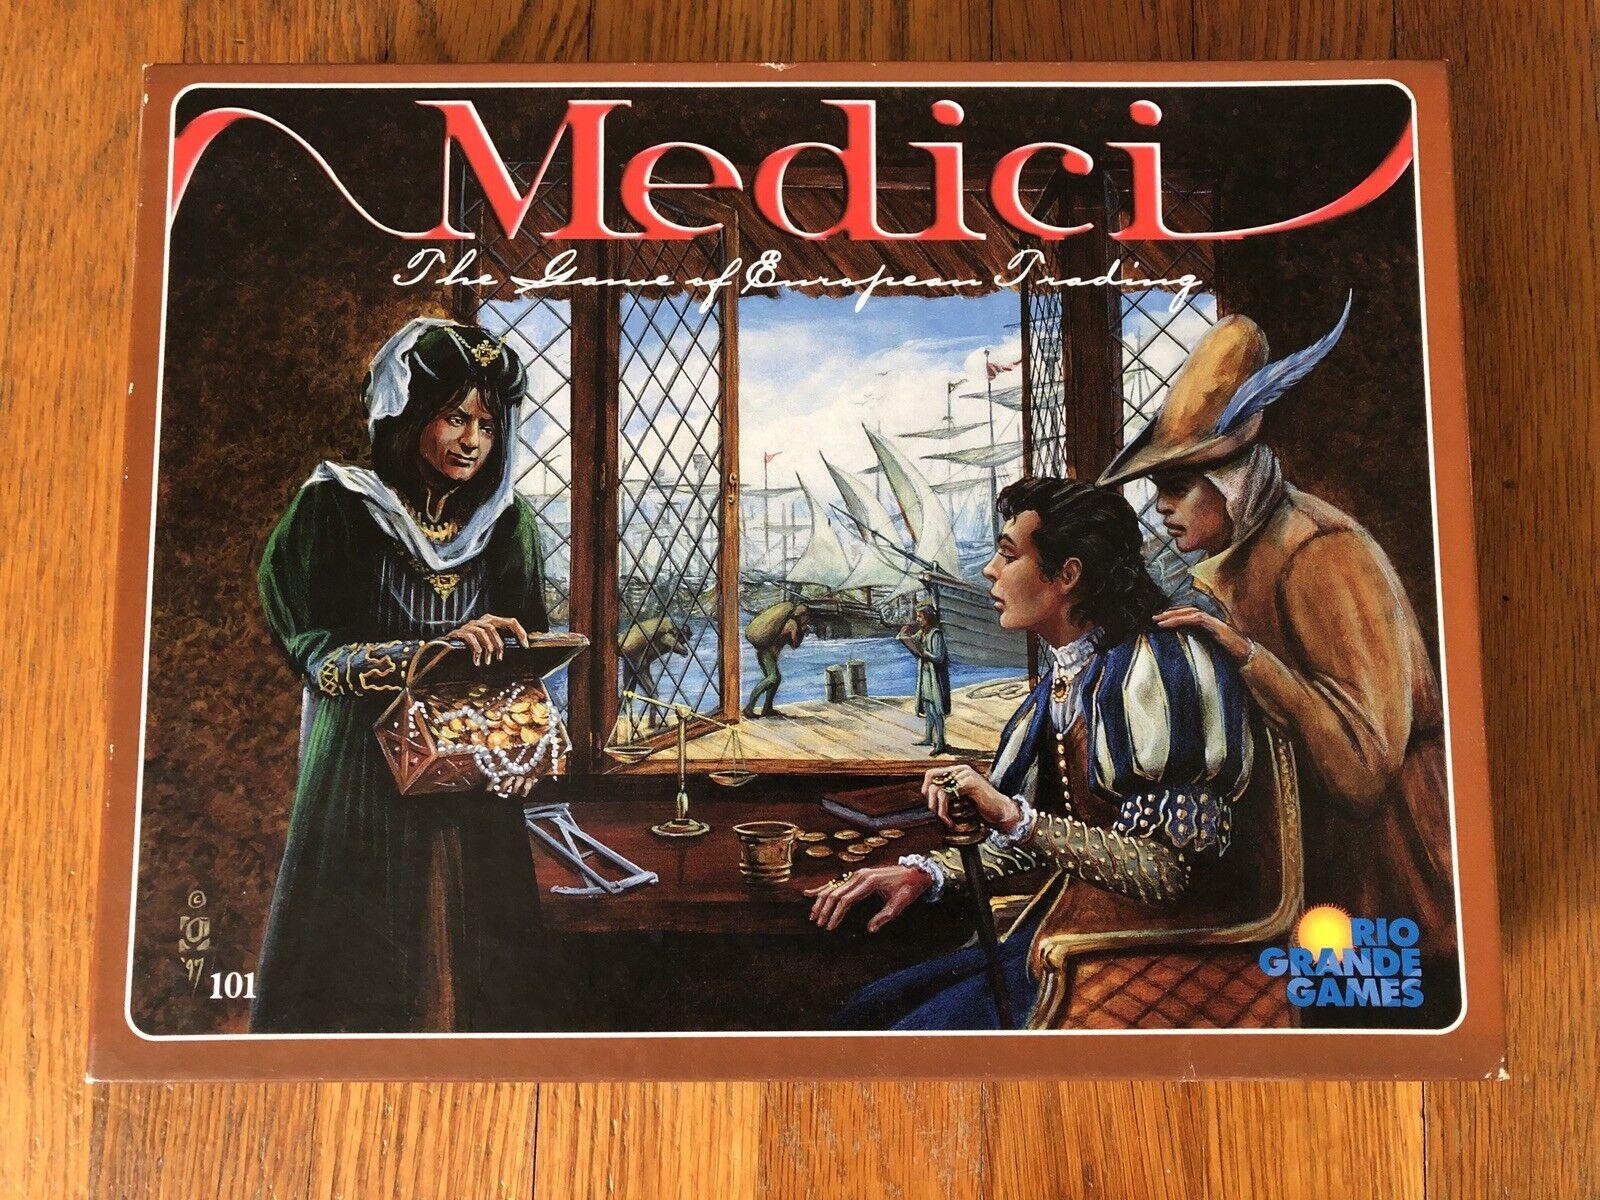 Medici brettspiel - 1. druck - rio grande games - vg lage